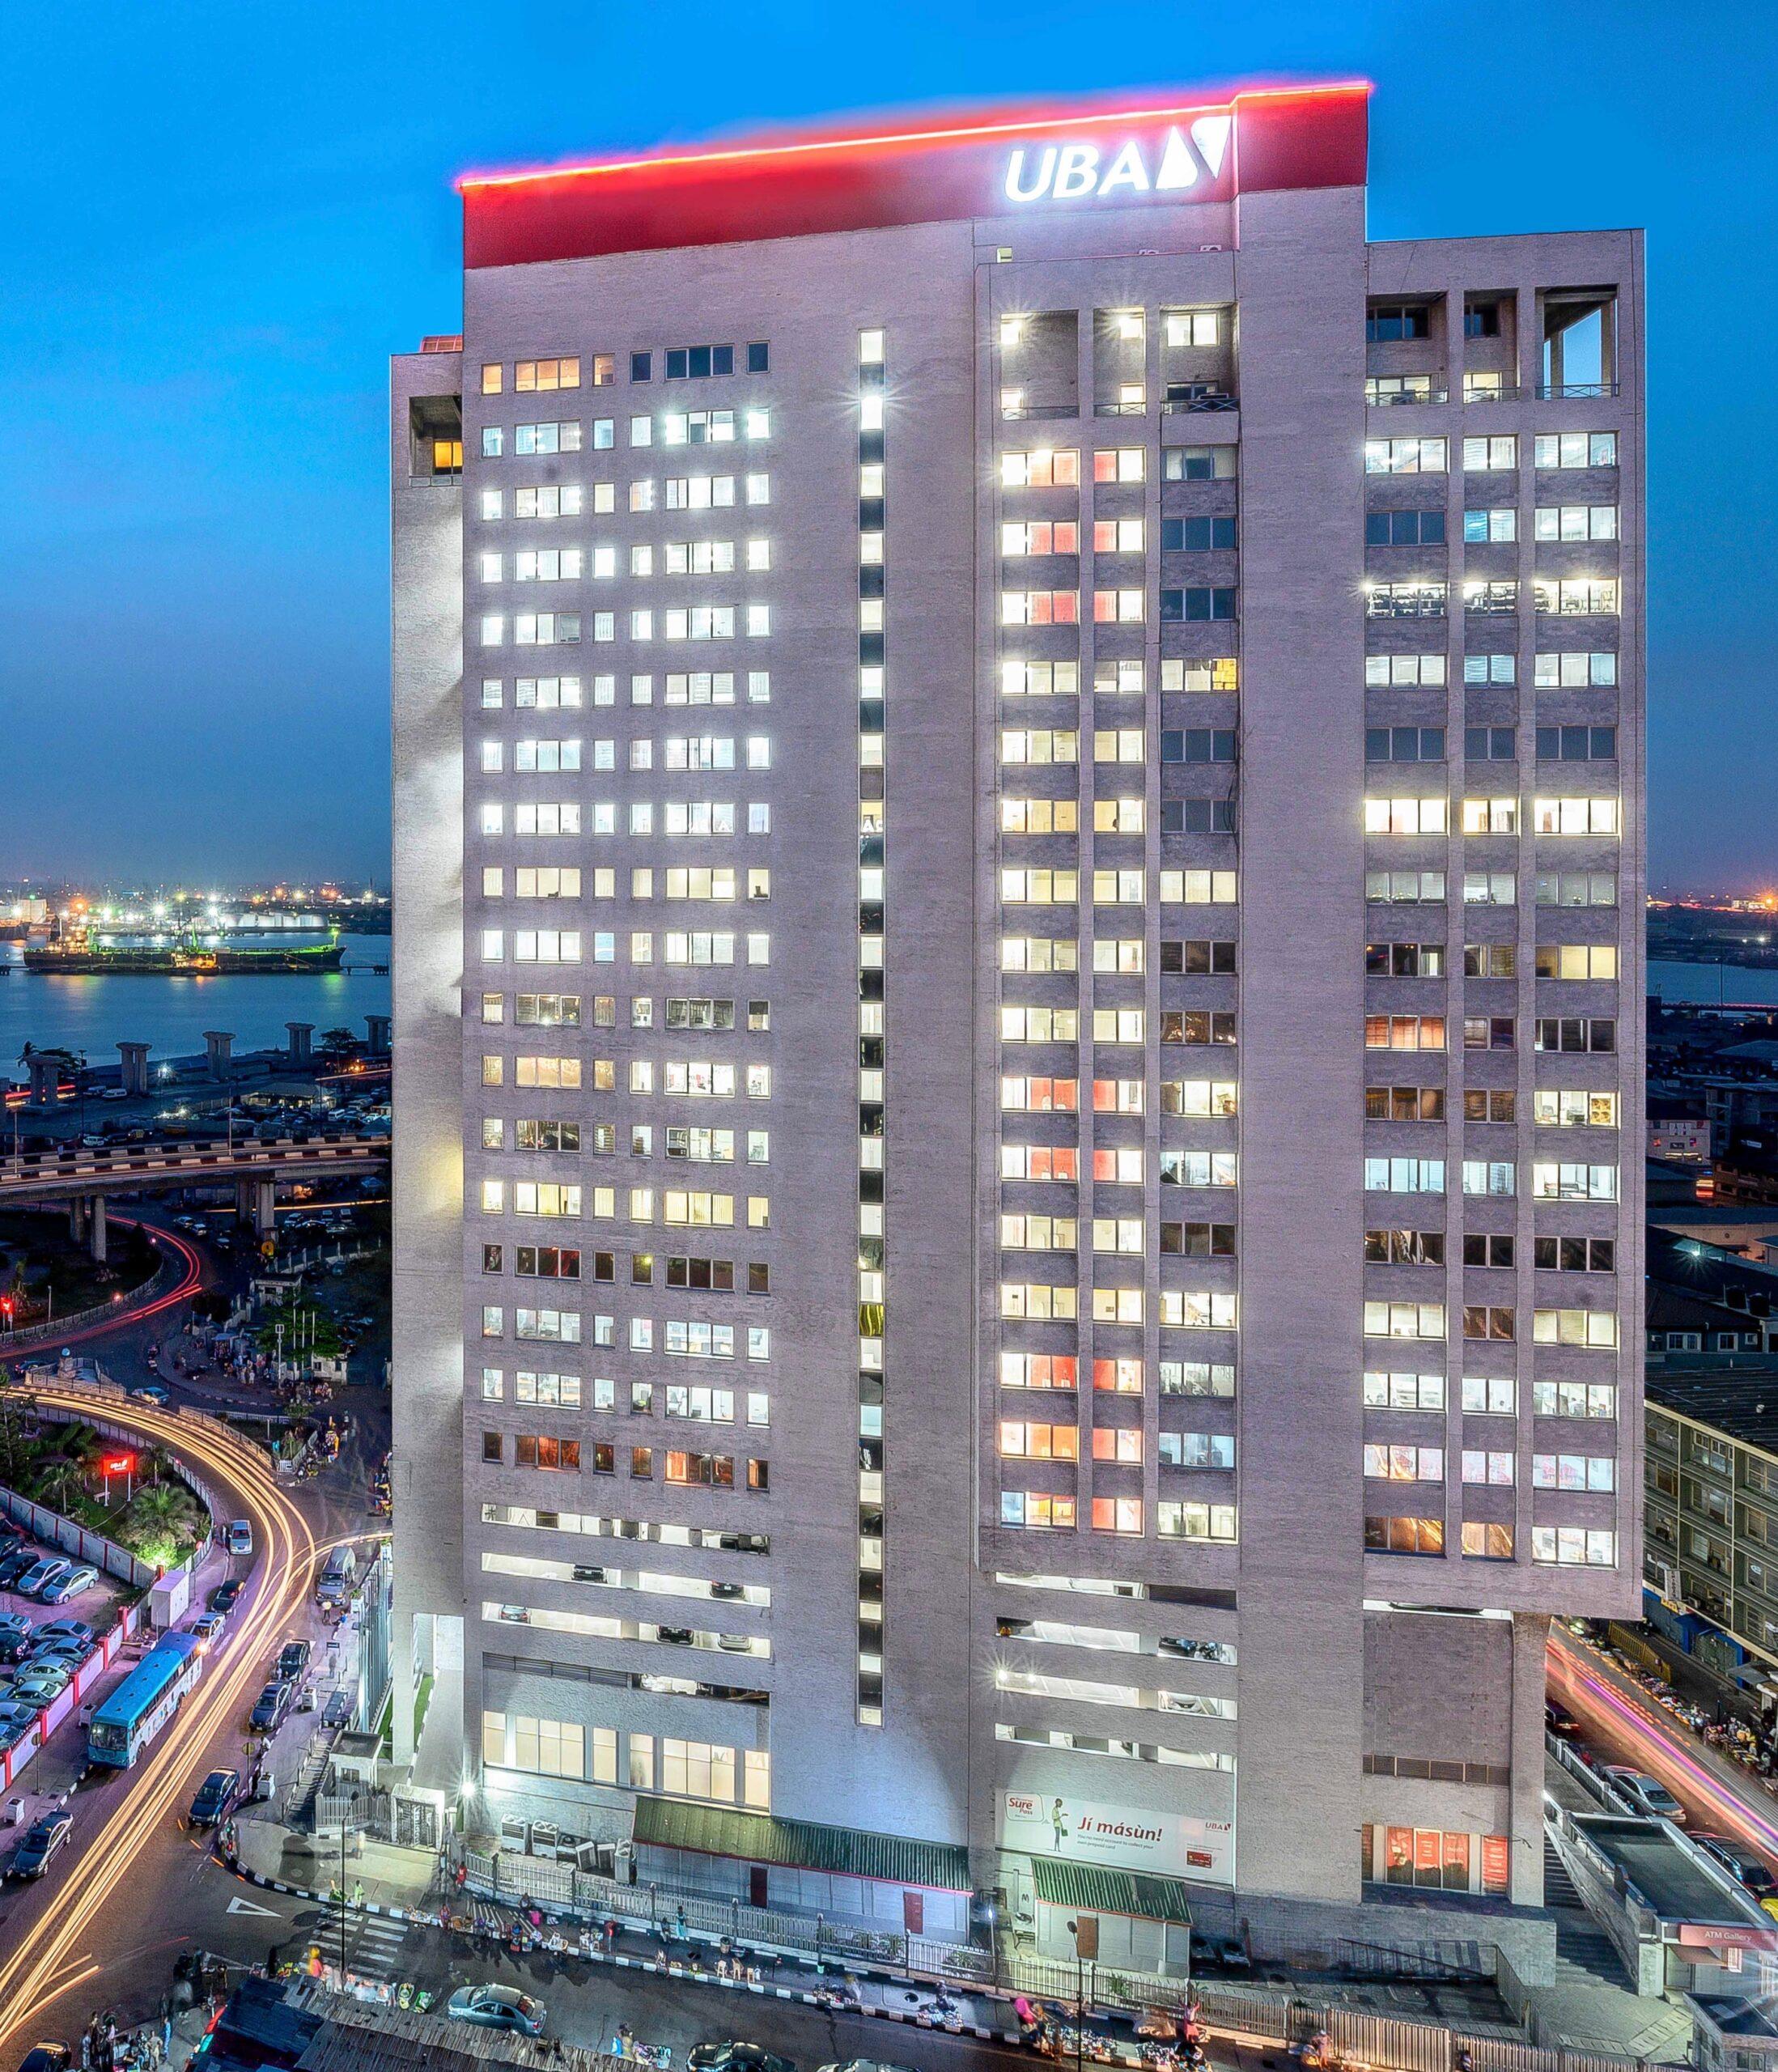 UBA's Half-year Profit Grows By 33% to N76.2 Billion...Declares 20k per share interim dividend